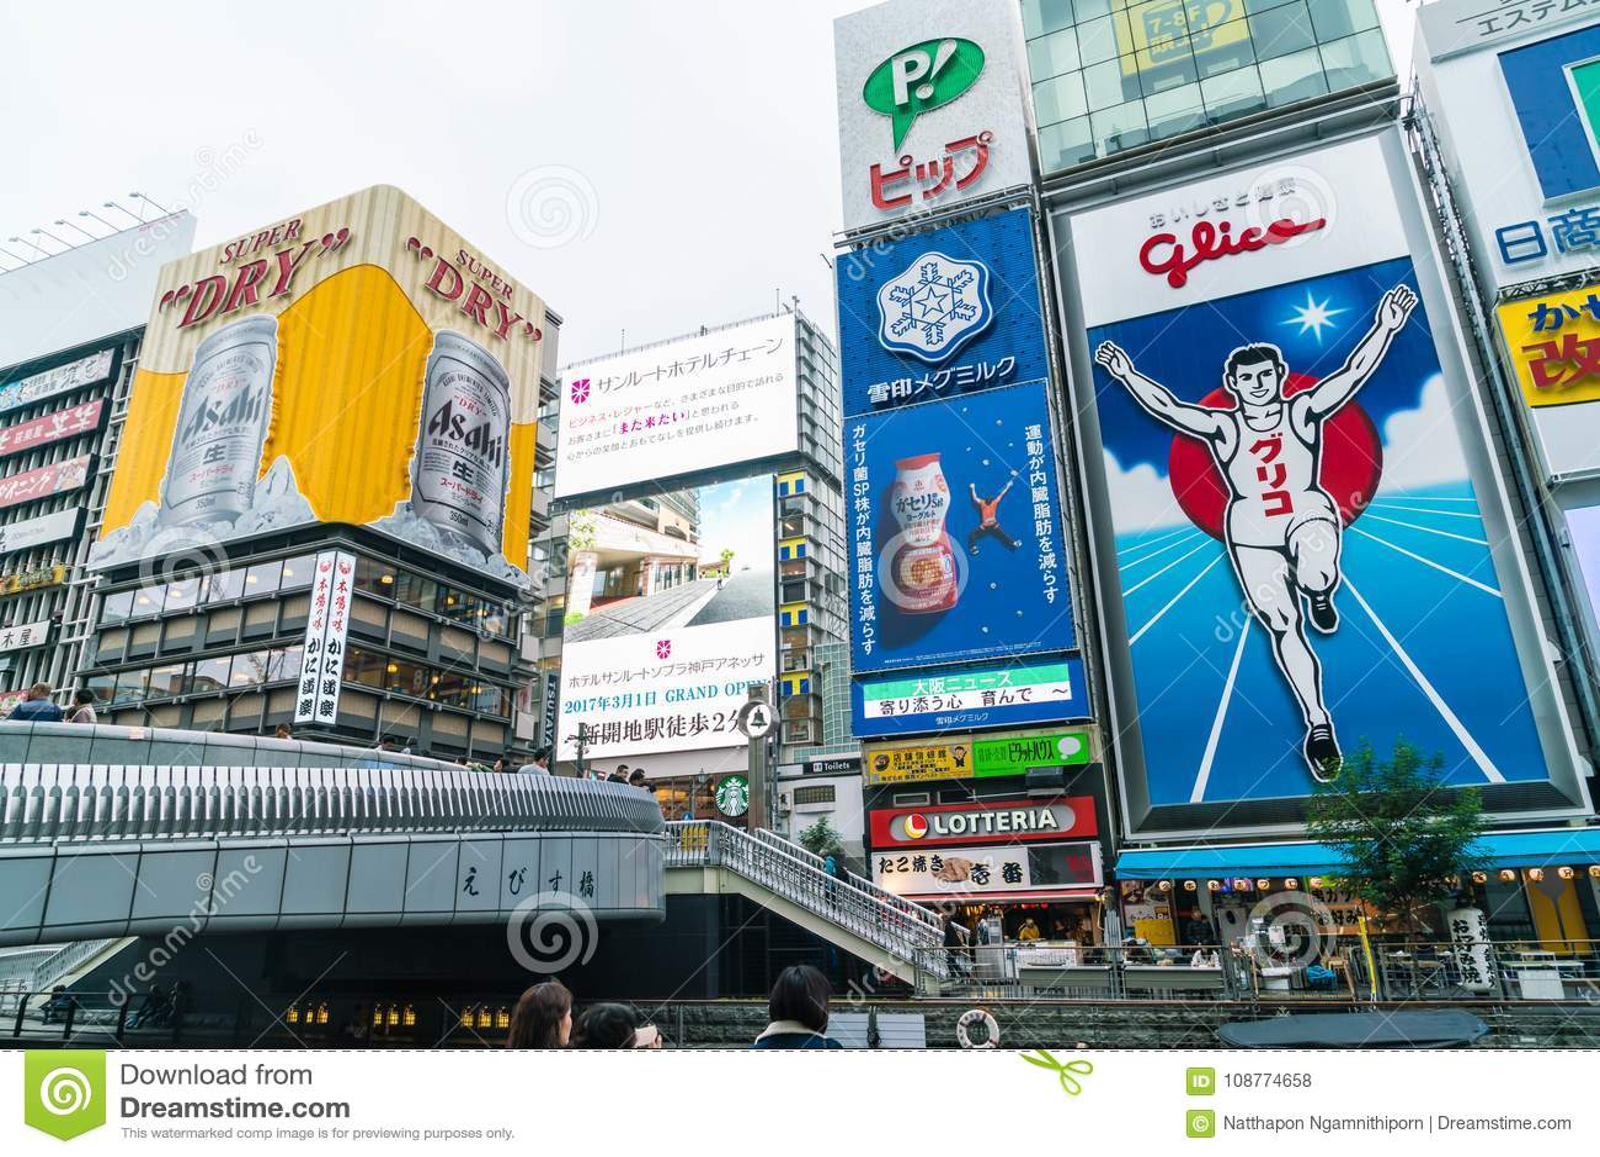 OSAKA, JAPAN - NOV 19 2016: Group Of The People Walking To Shopp ...